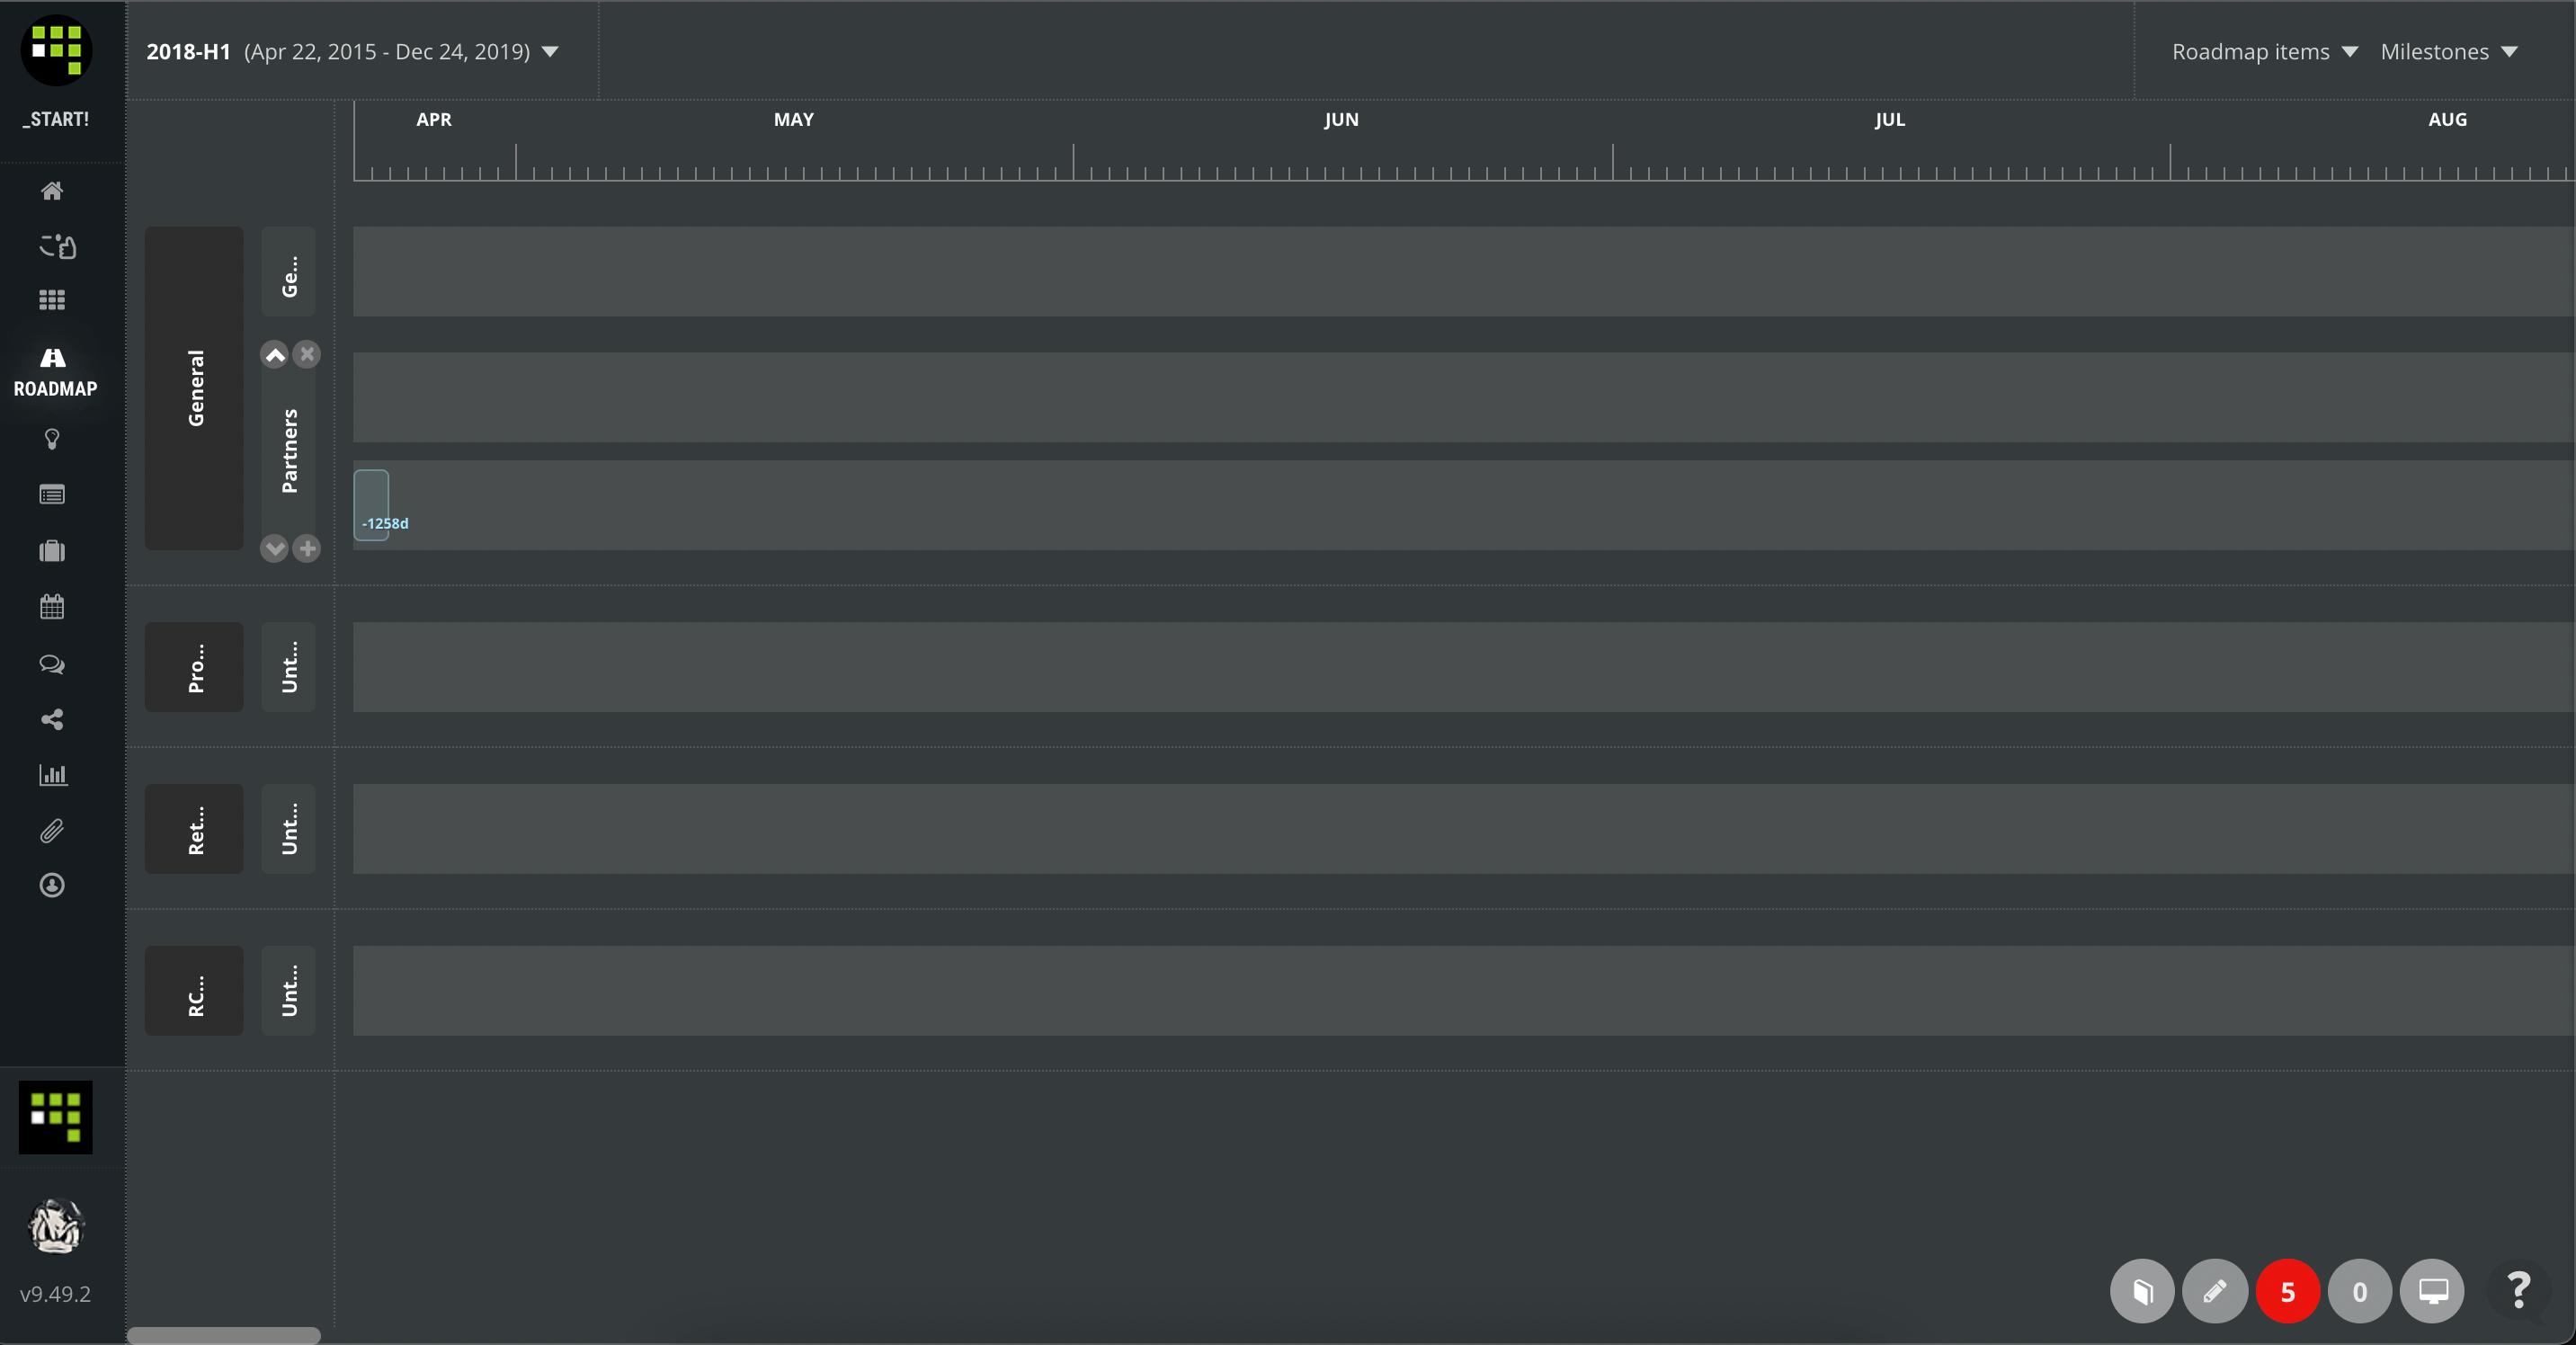 how to change order of roadmap rows in ScrumDesk